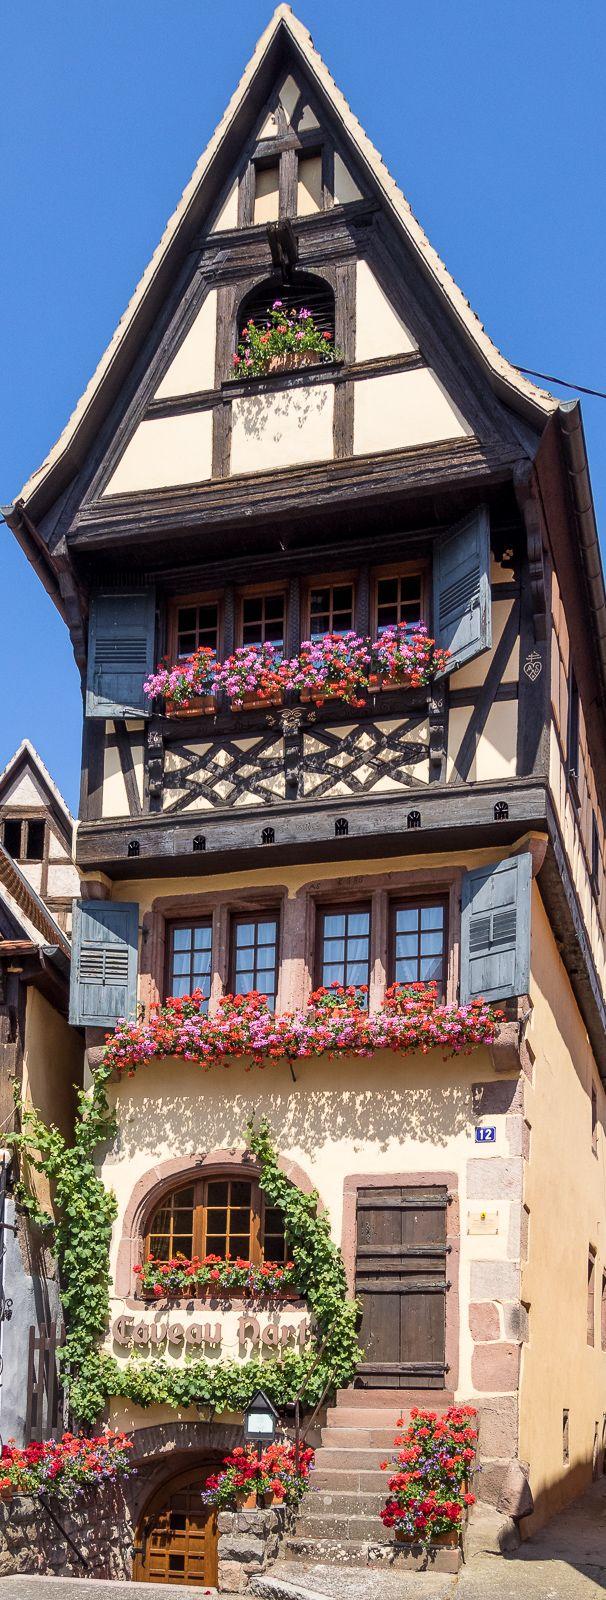 Caveau Nartz restaurant in Dambach-la-Ville, Alsace, France